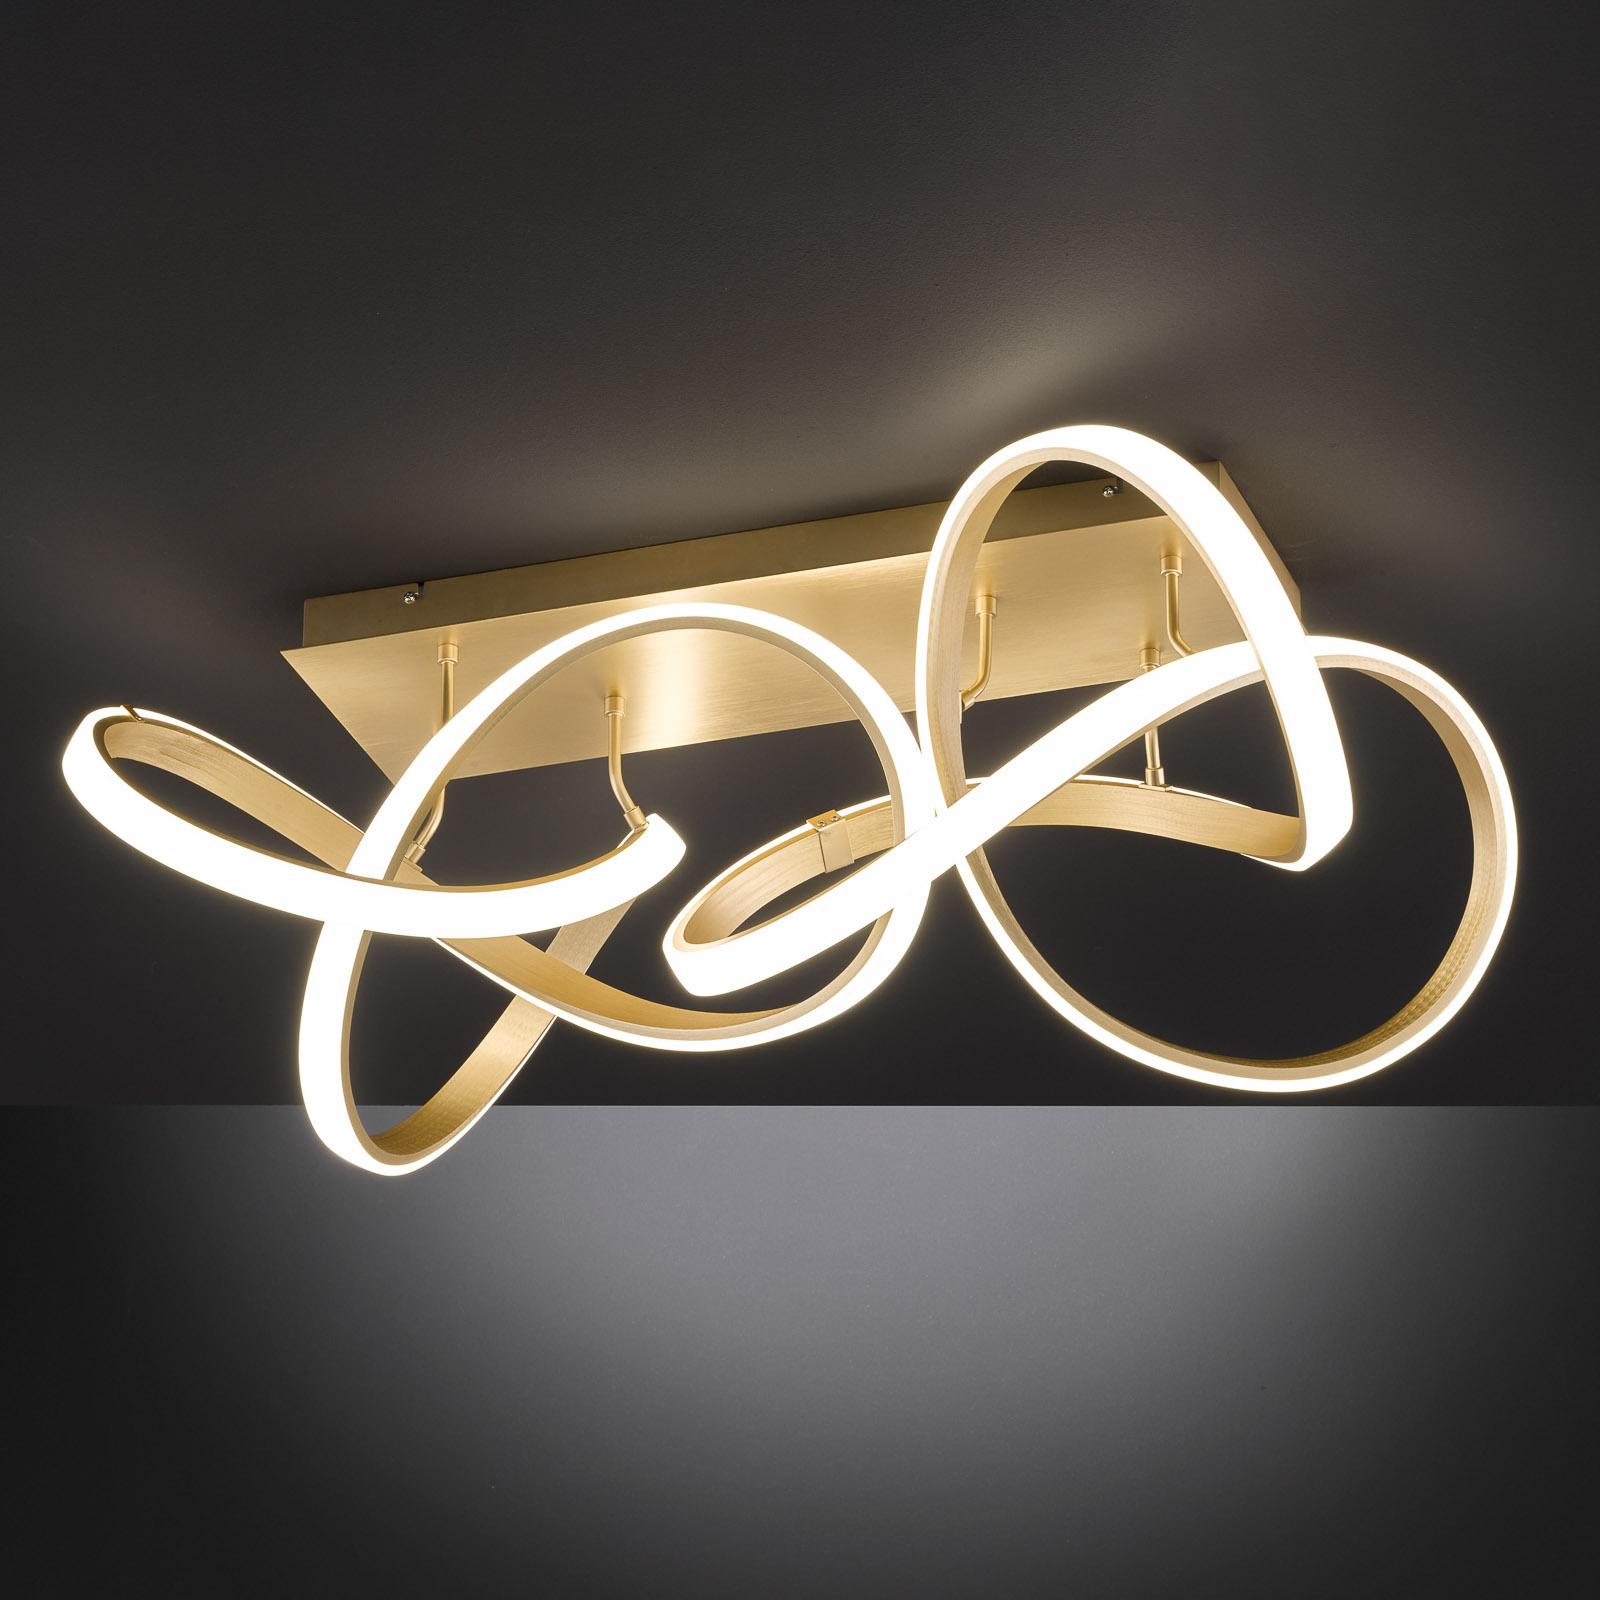 LED-taklampe Indigo, 2 lyskilder, gull matt